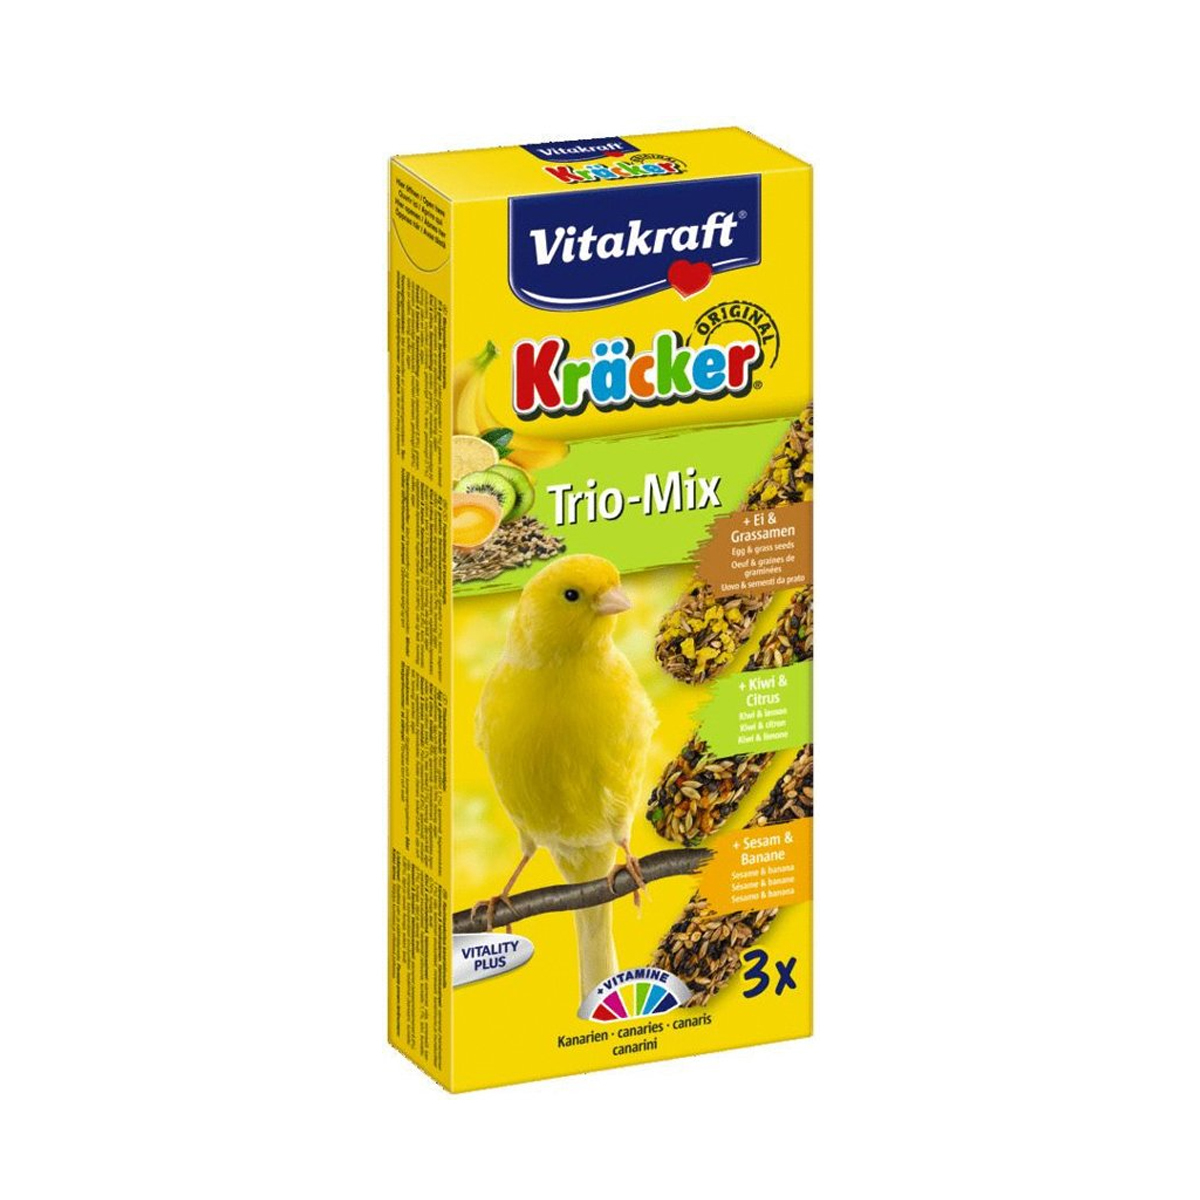 Vitakraft Trio Mix Kräcker Vogelsnack Kanarie 3in1 Orange-Sesam-Banaan-Kiwi